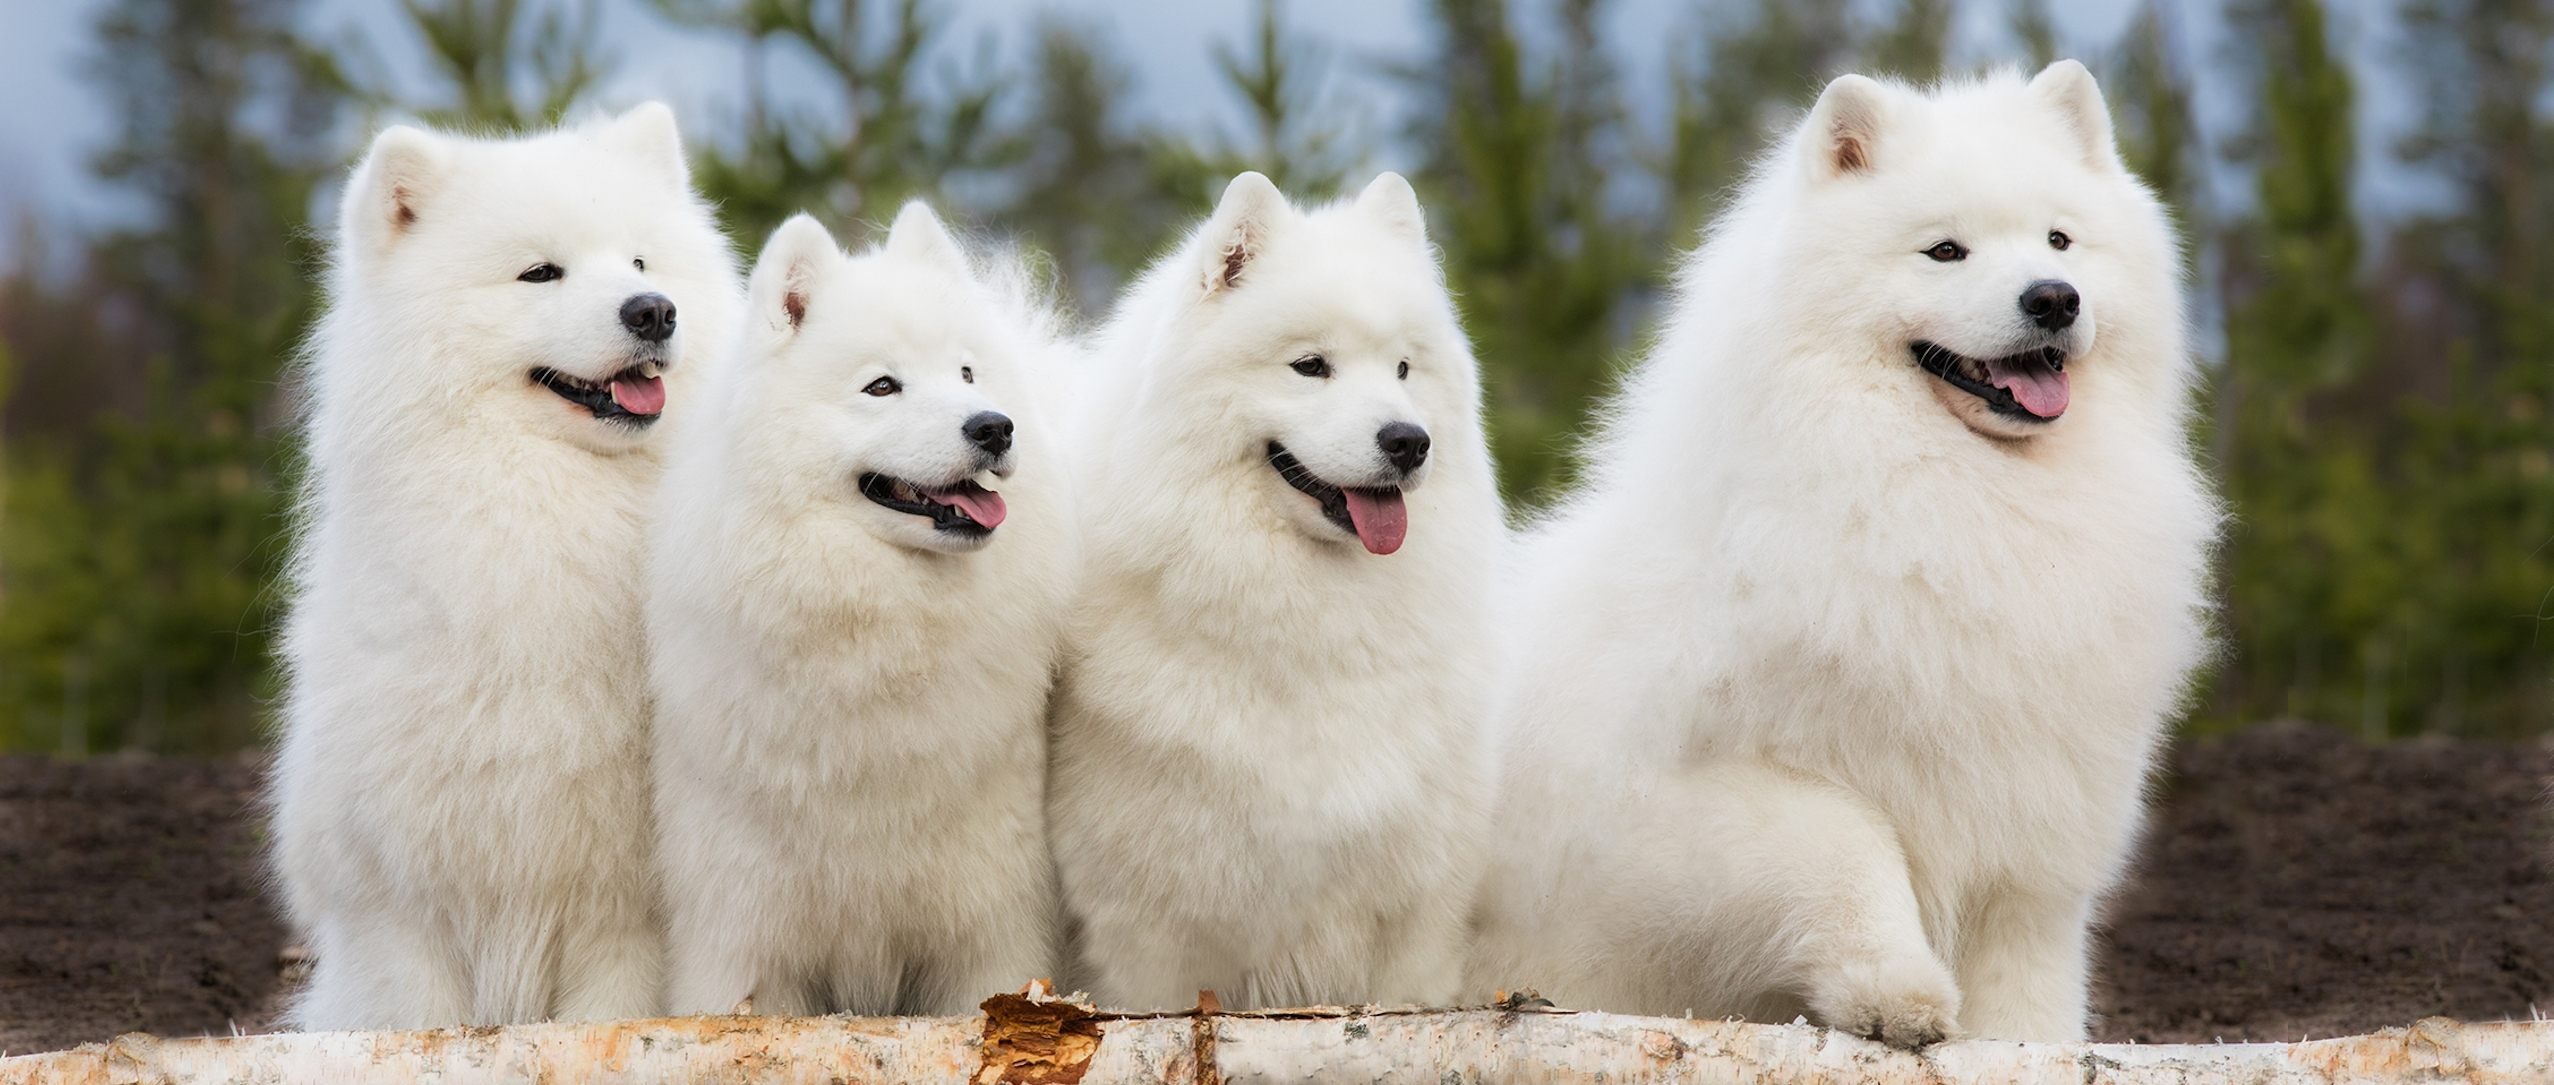 Snowmist samojedinkoiria.